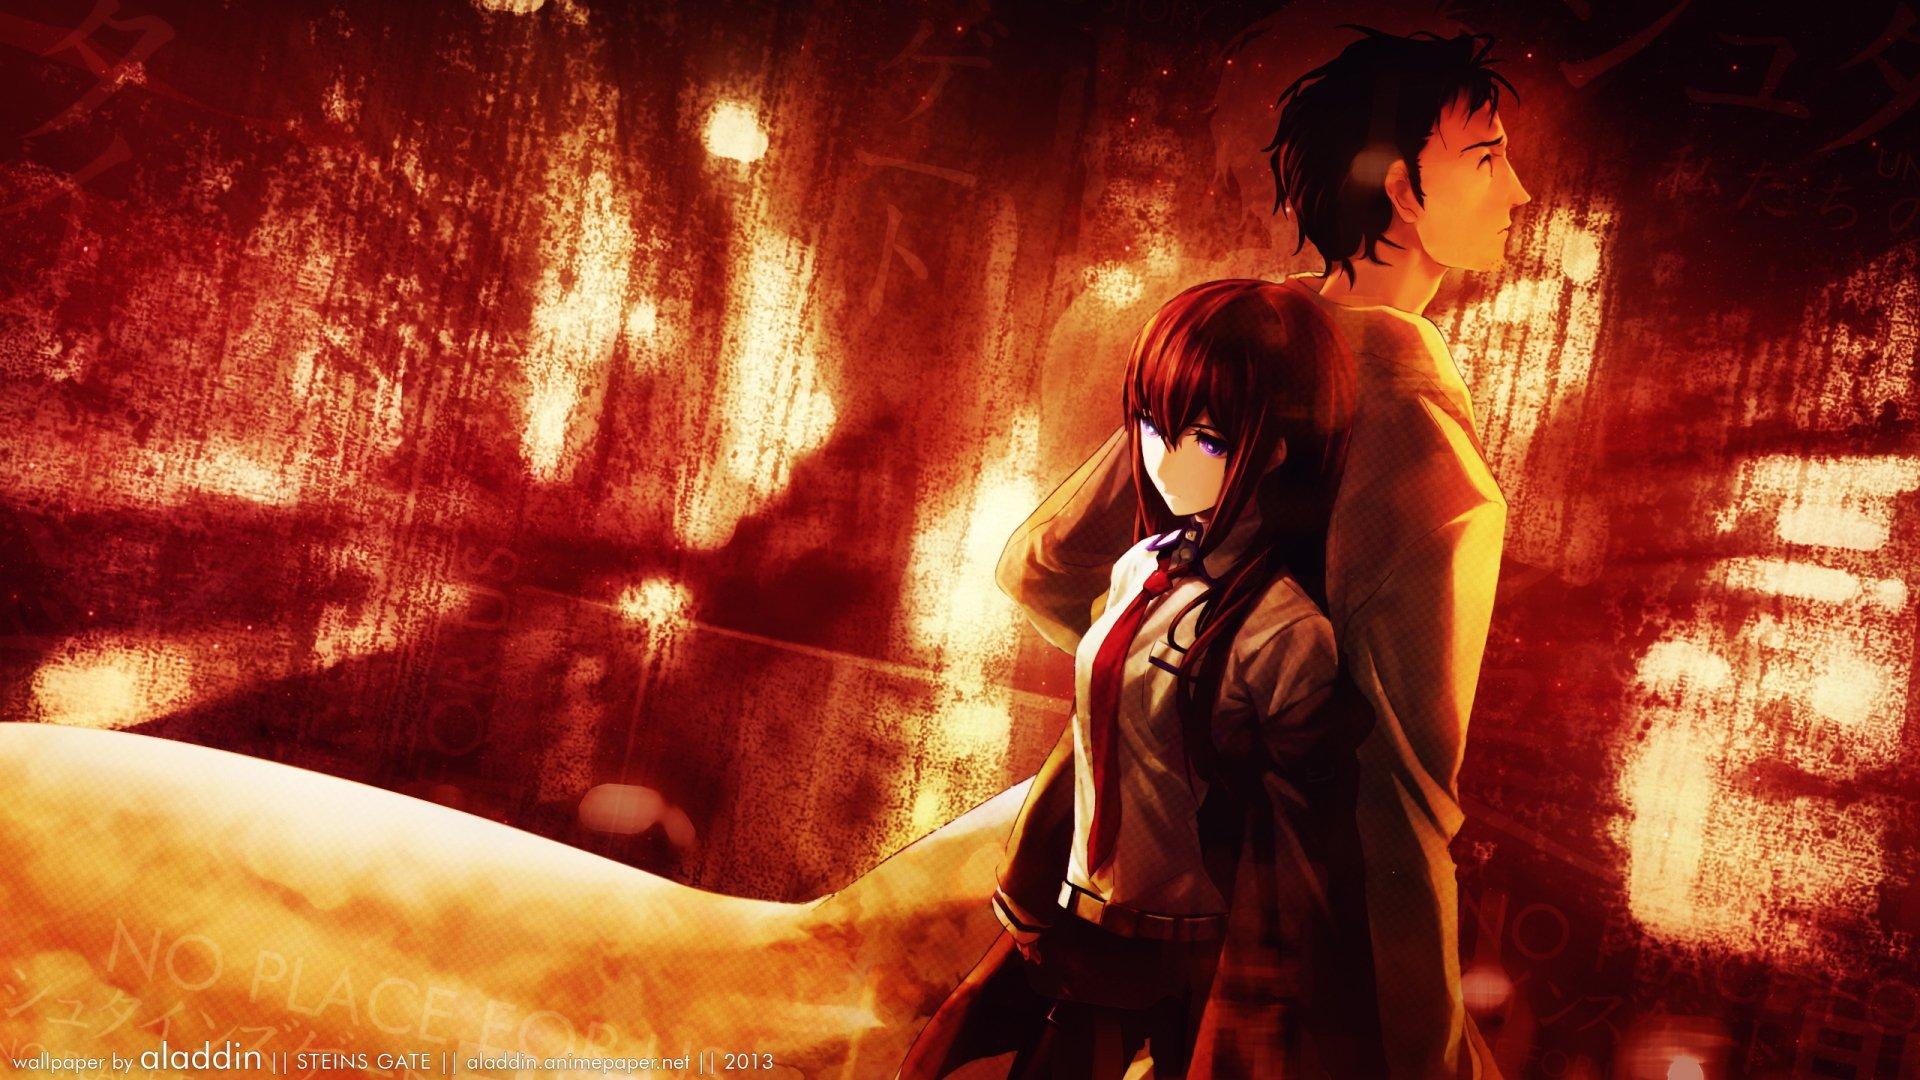 Makise Kurisu & Rintaro Okabe HD Wallpaper | Background ...